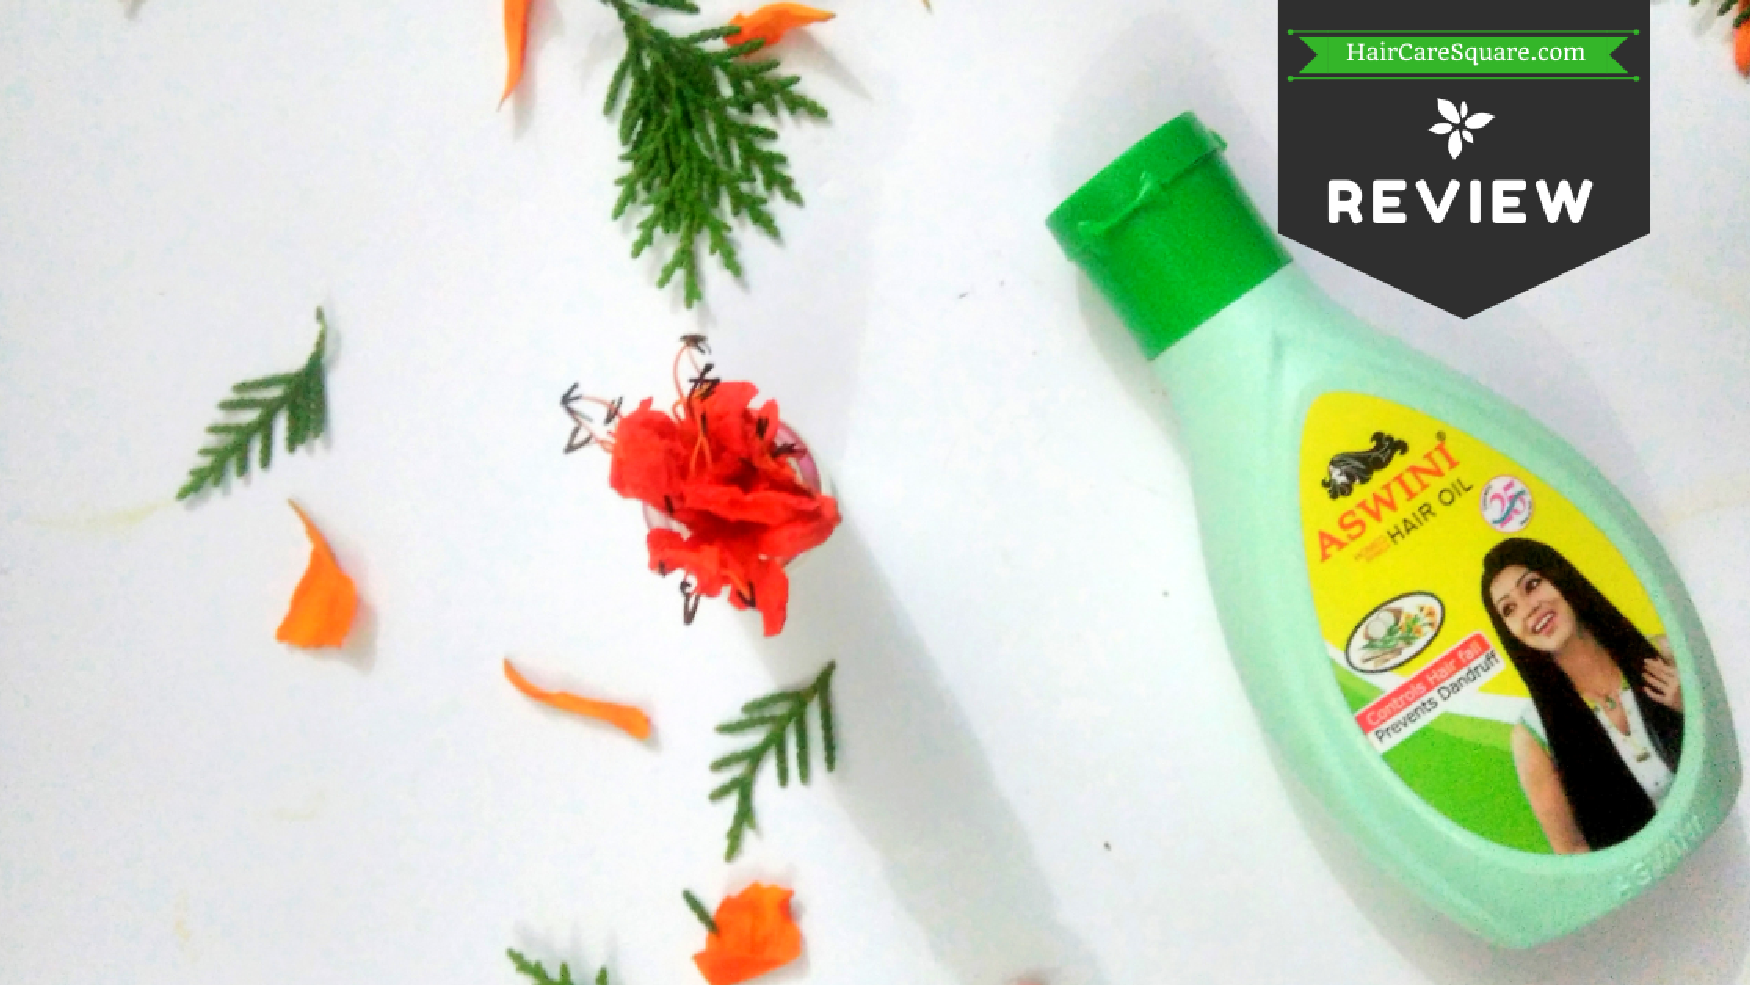 Ashwini Homeo Arnica Hair Oil Review - The Homeopathic Hair Treatment !!!